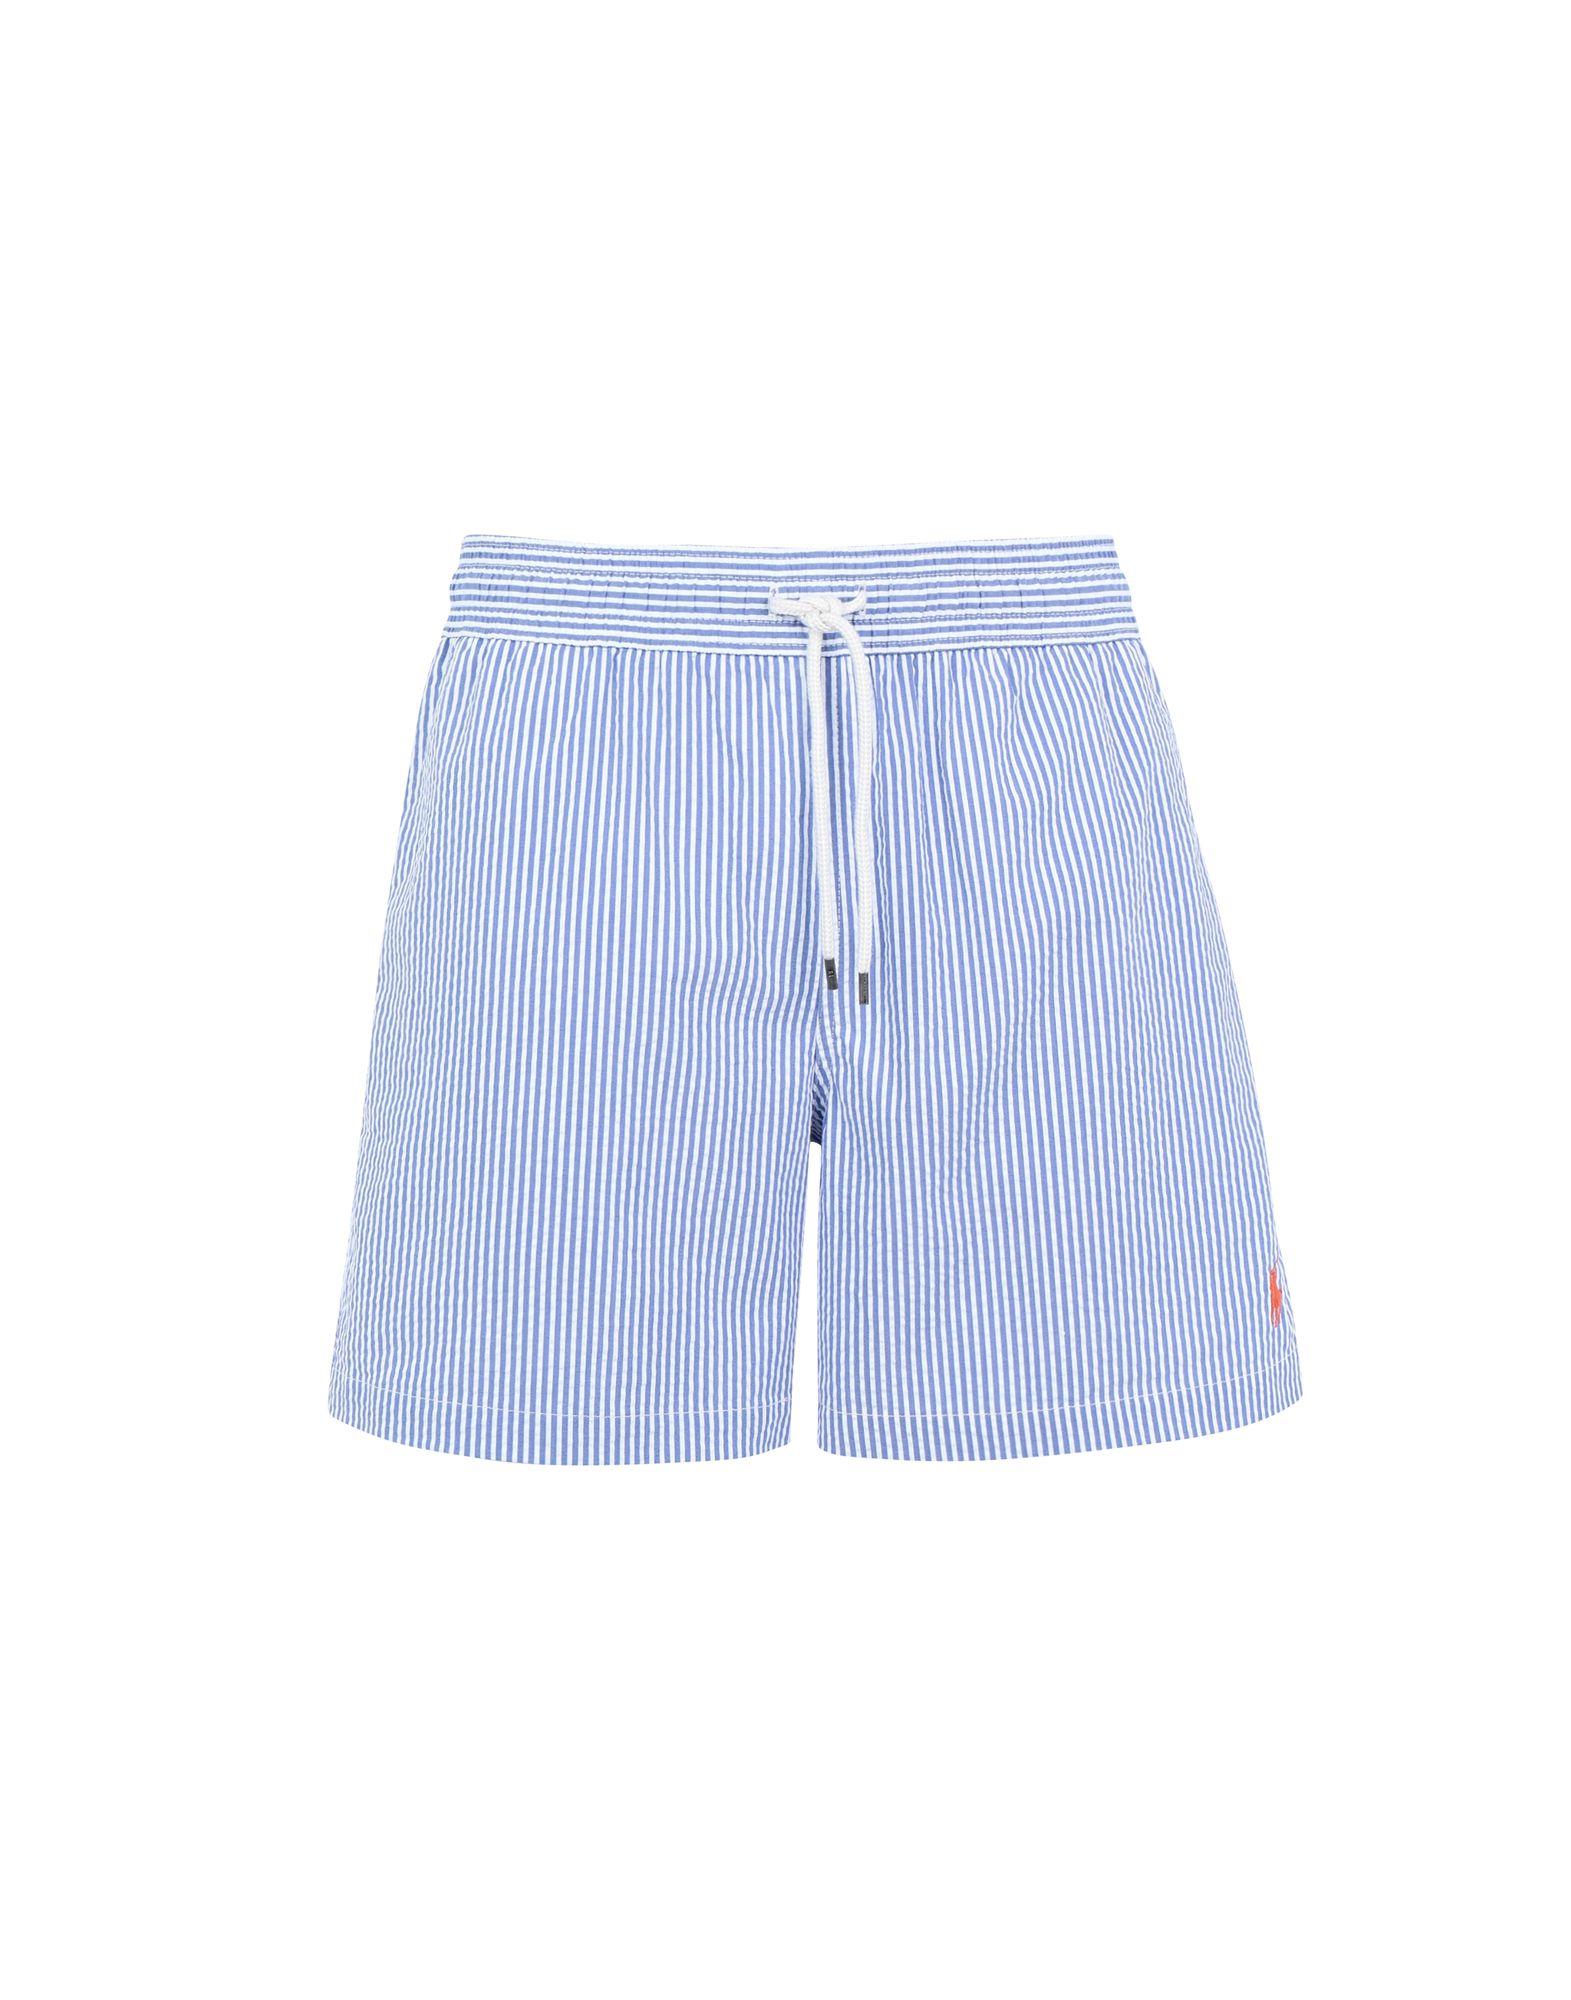 1e54f96ae0 Polo Ralph Lauren 5½-Inch Seersucker Swim Trunk - Swim Shorts - Men ...